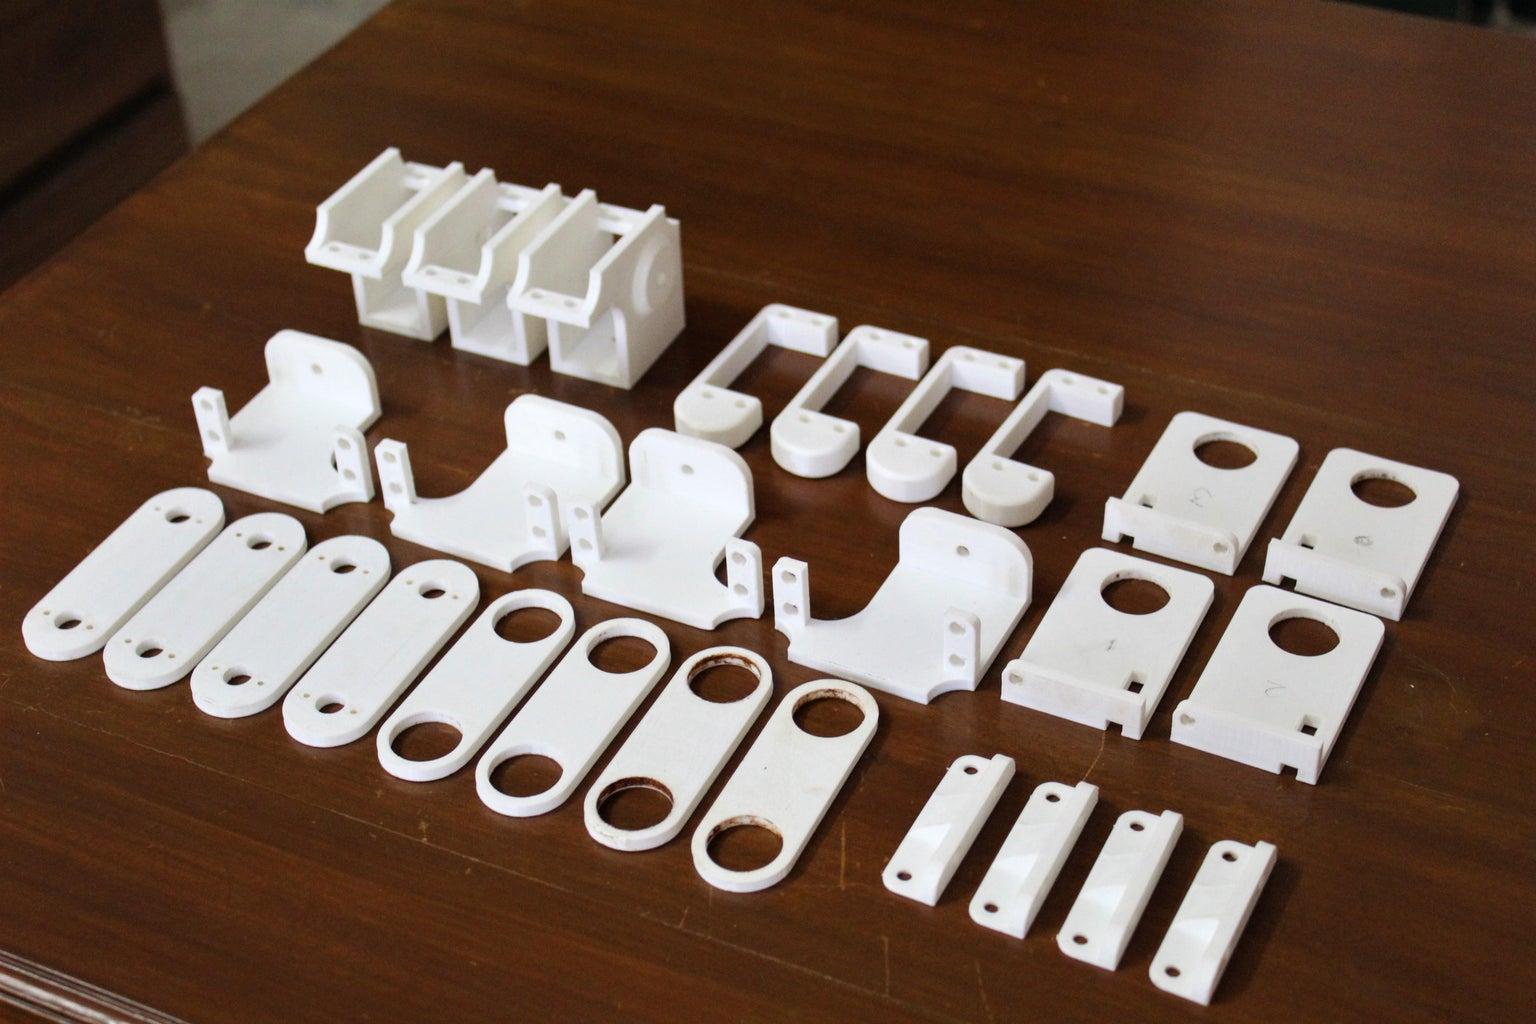 Digitally Fabricated Parts